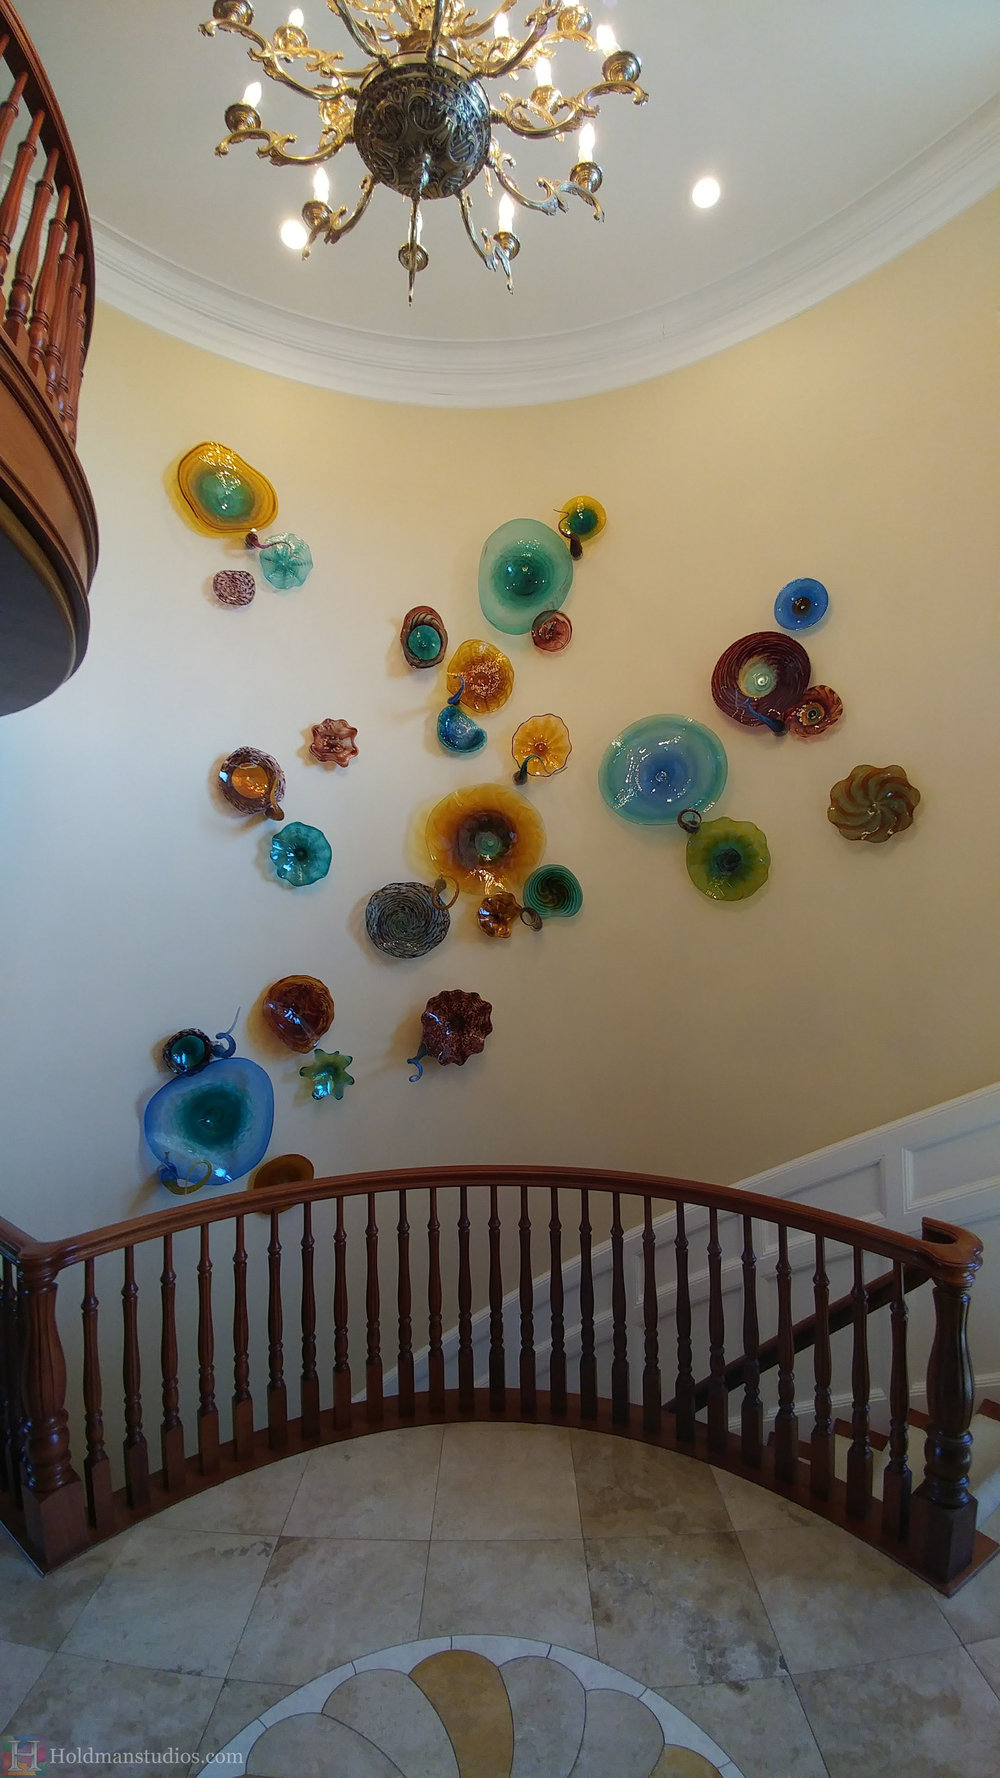 holdman-studios-hand-blown-glass-platters-bowls-tendrils-stair-wall-display.jpg